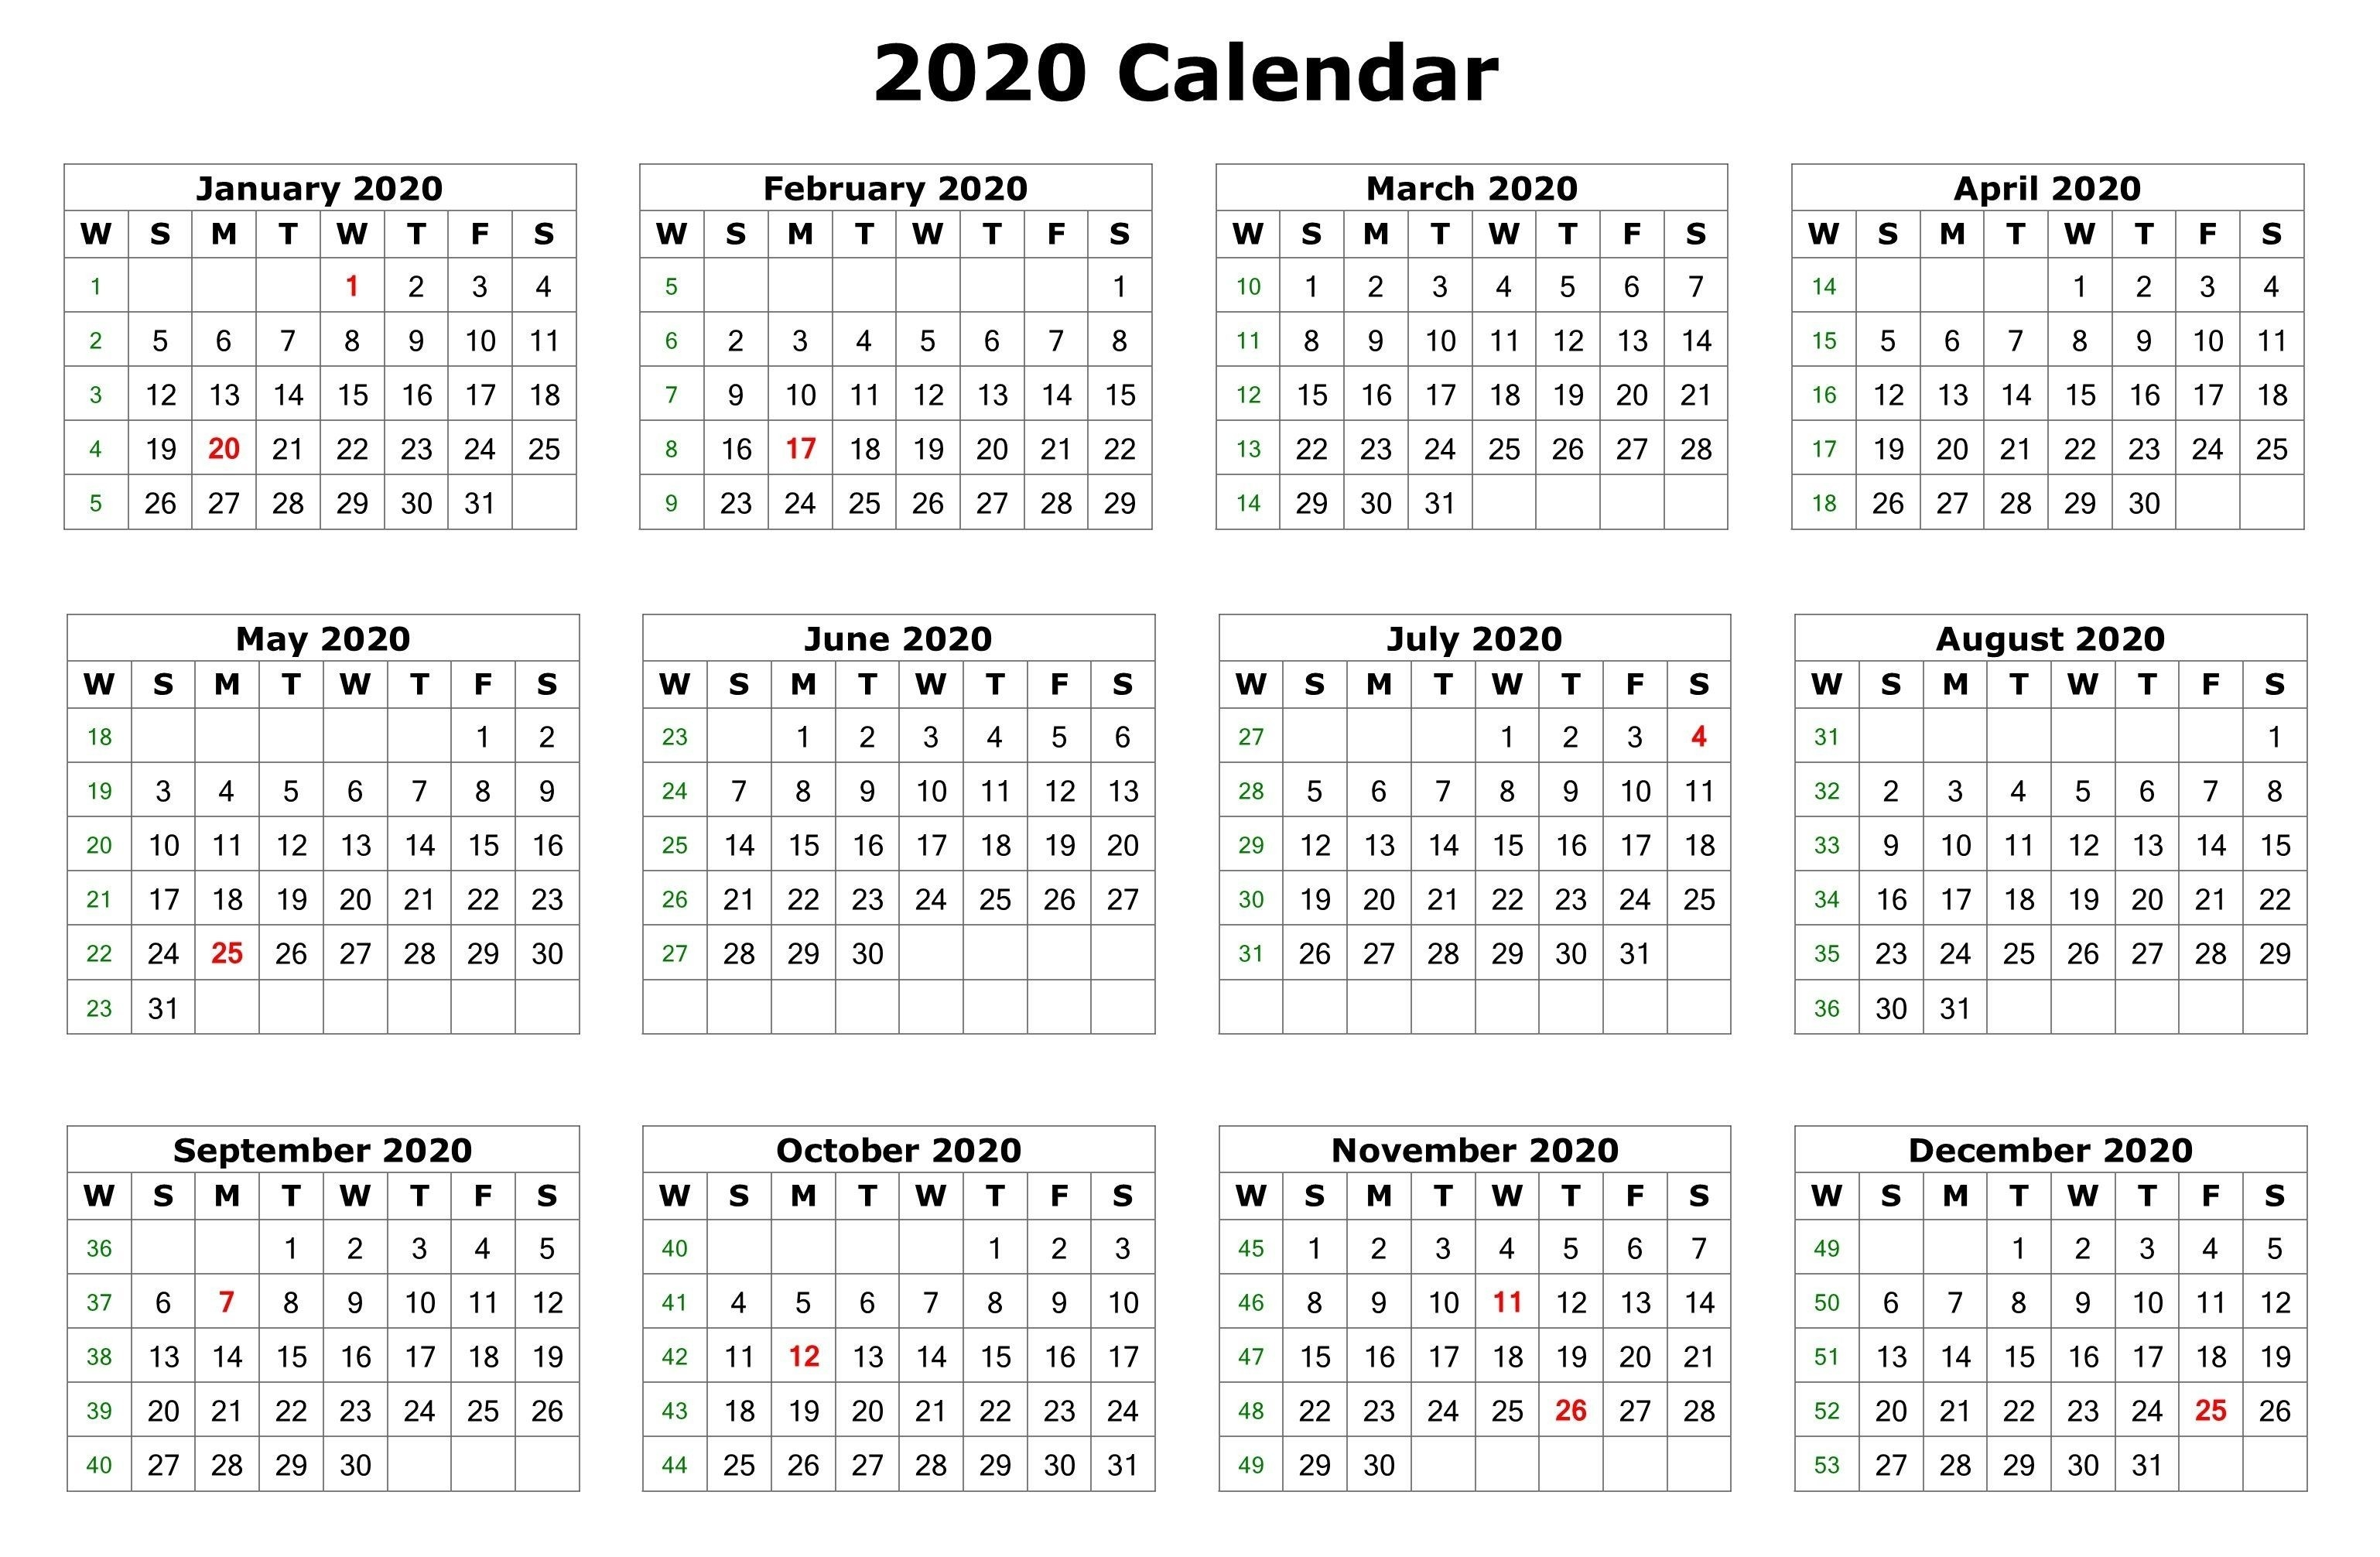 2020 12 Months Calendar Printable | Printable Calendar 2020-4 Month Calendar 2020 Template